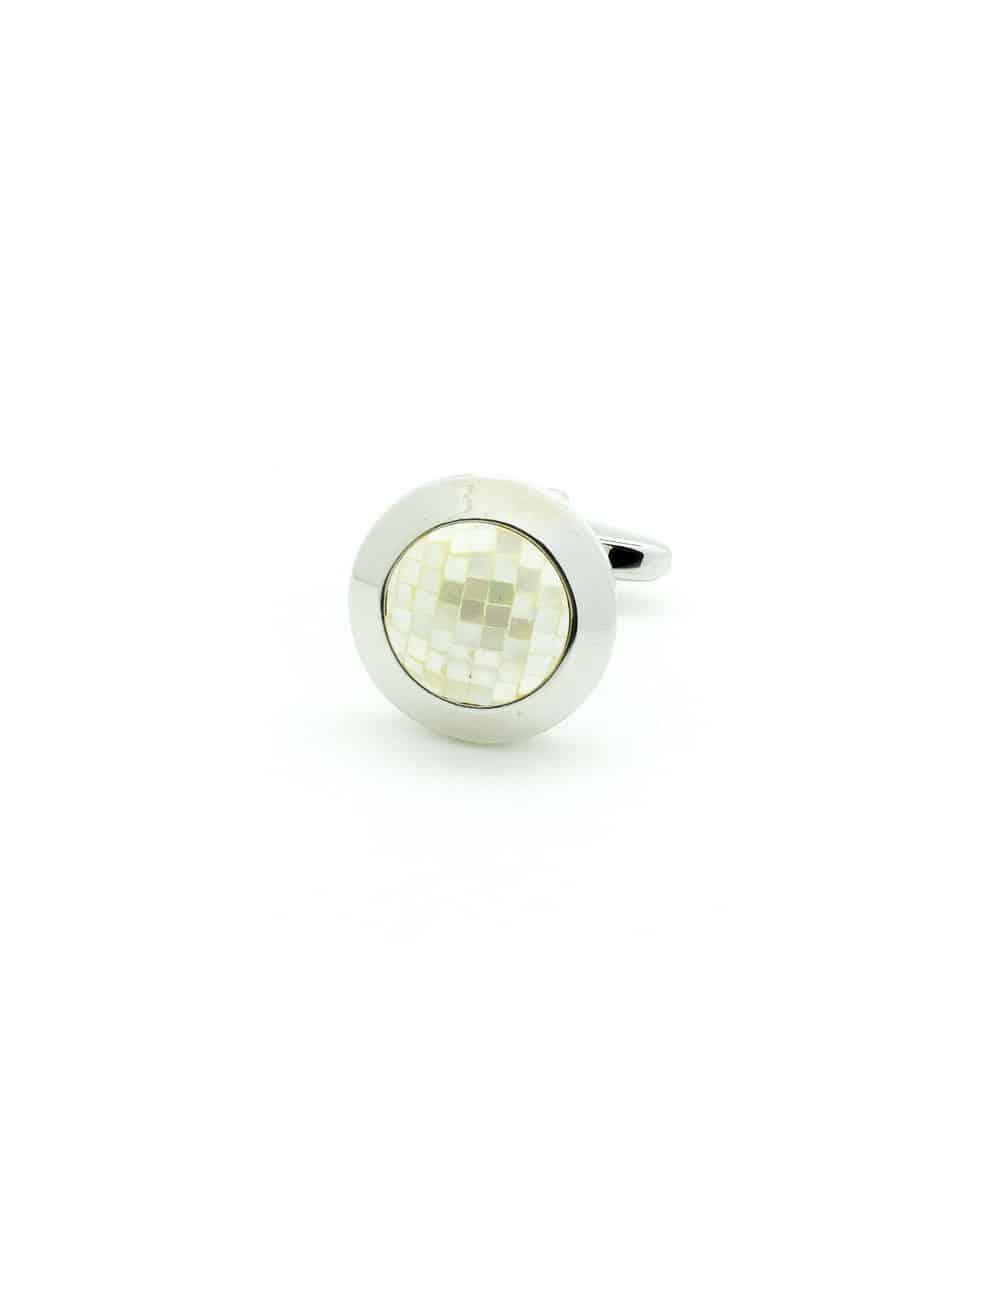 Beige Pearl Mosaic Cap Cufflink in Silver Round C131FP-087